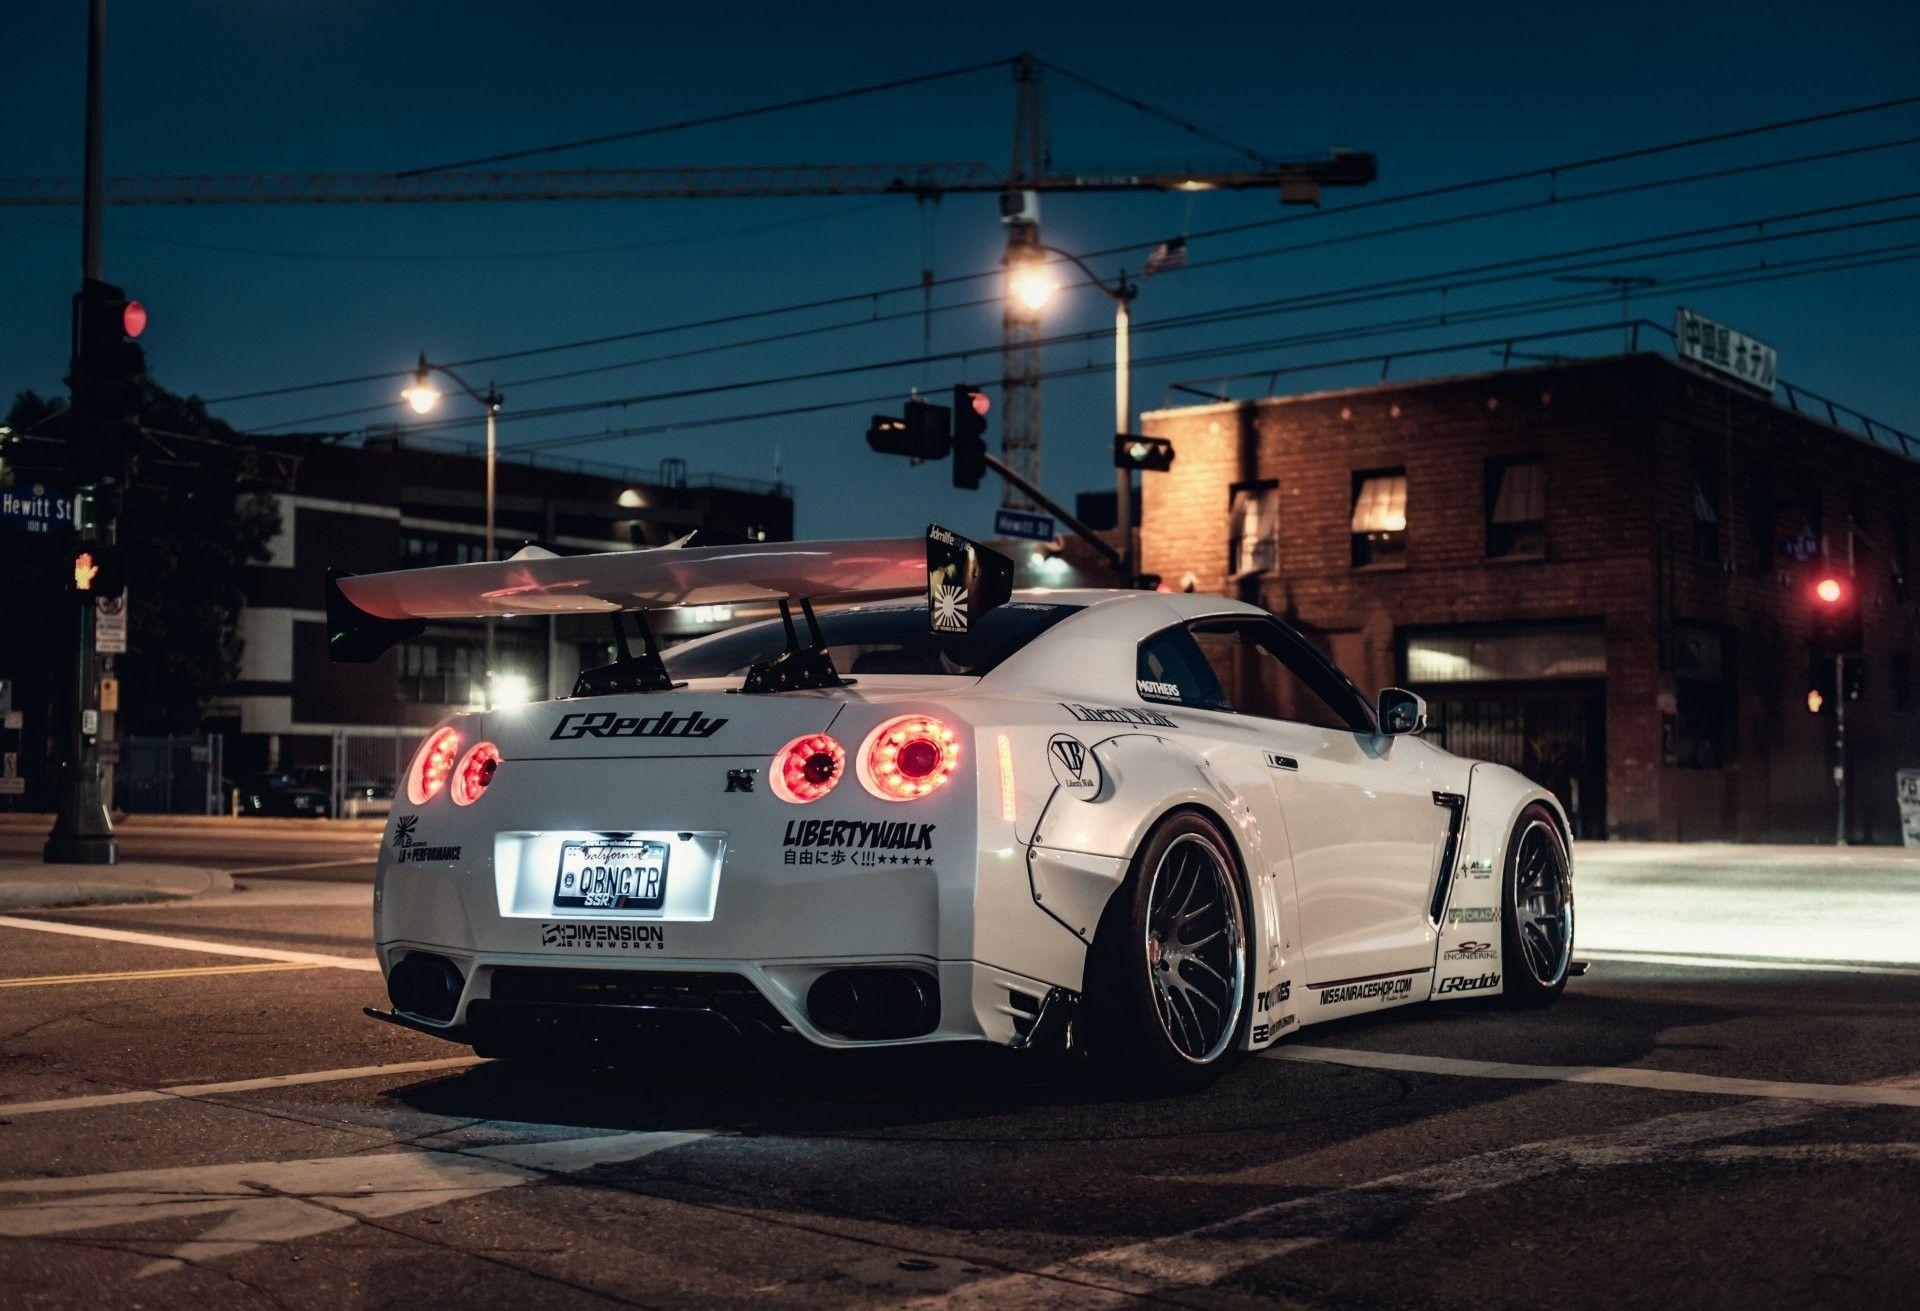 Nissan GT-R Liberty Walk 4K Wallpapers